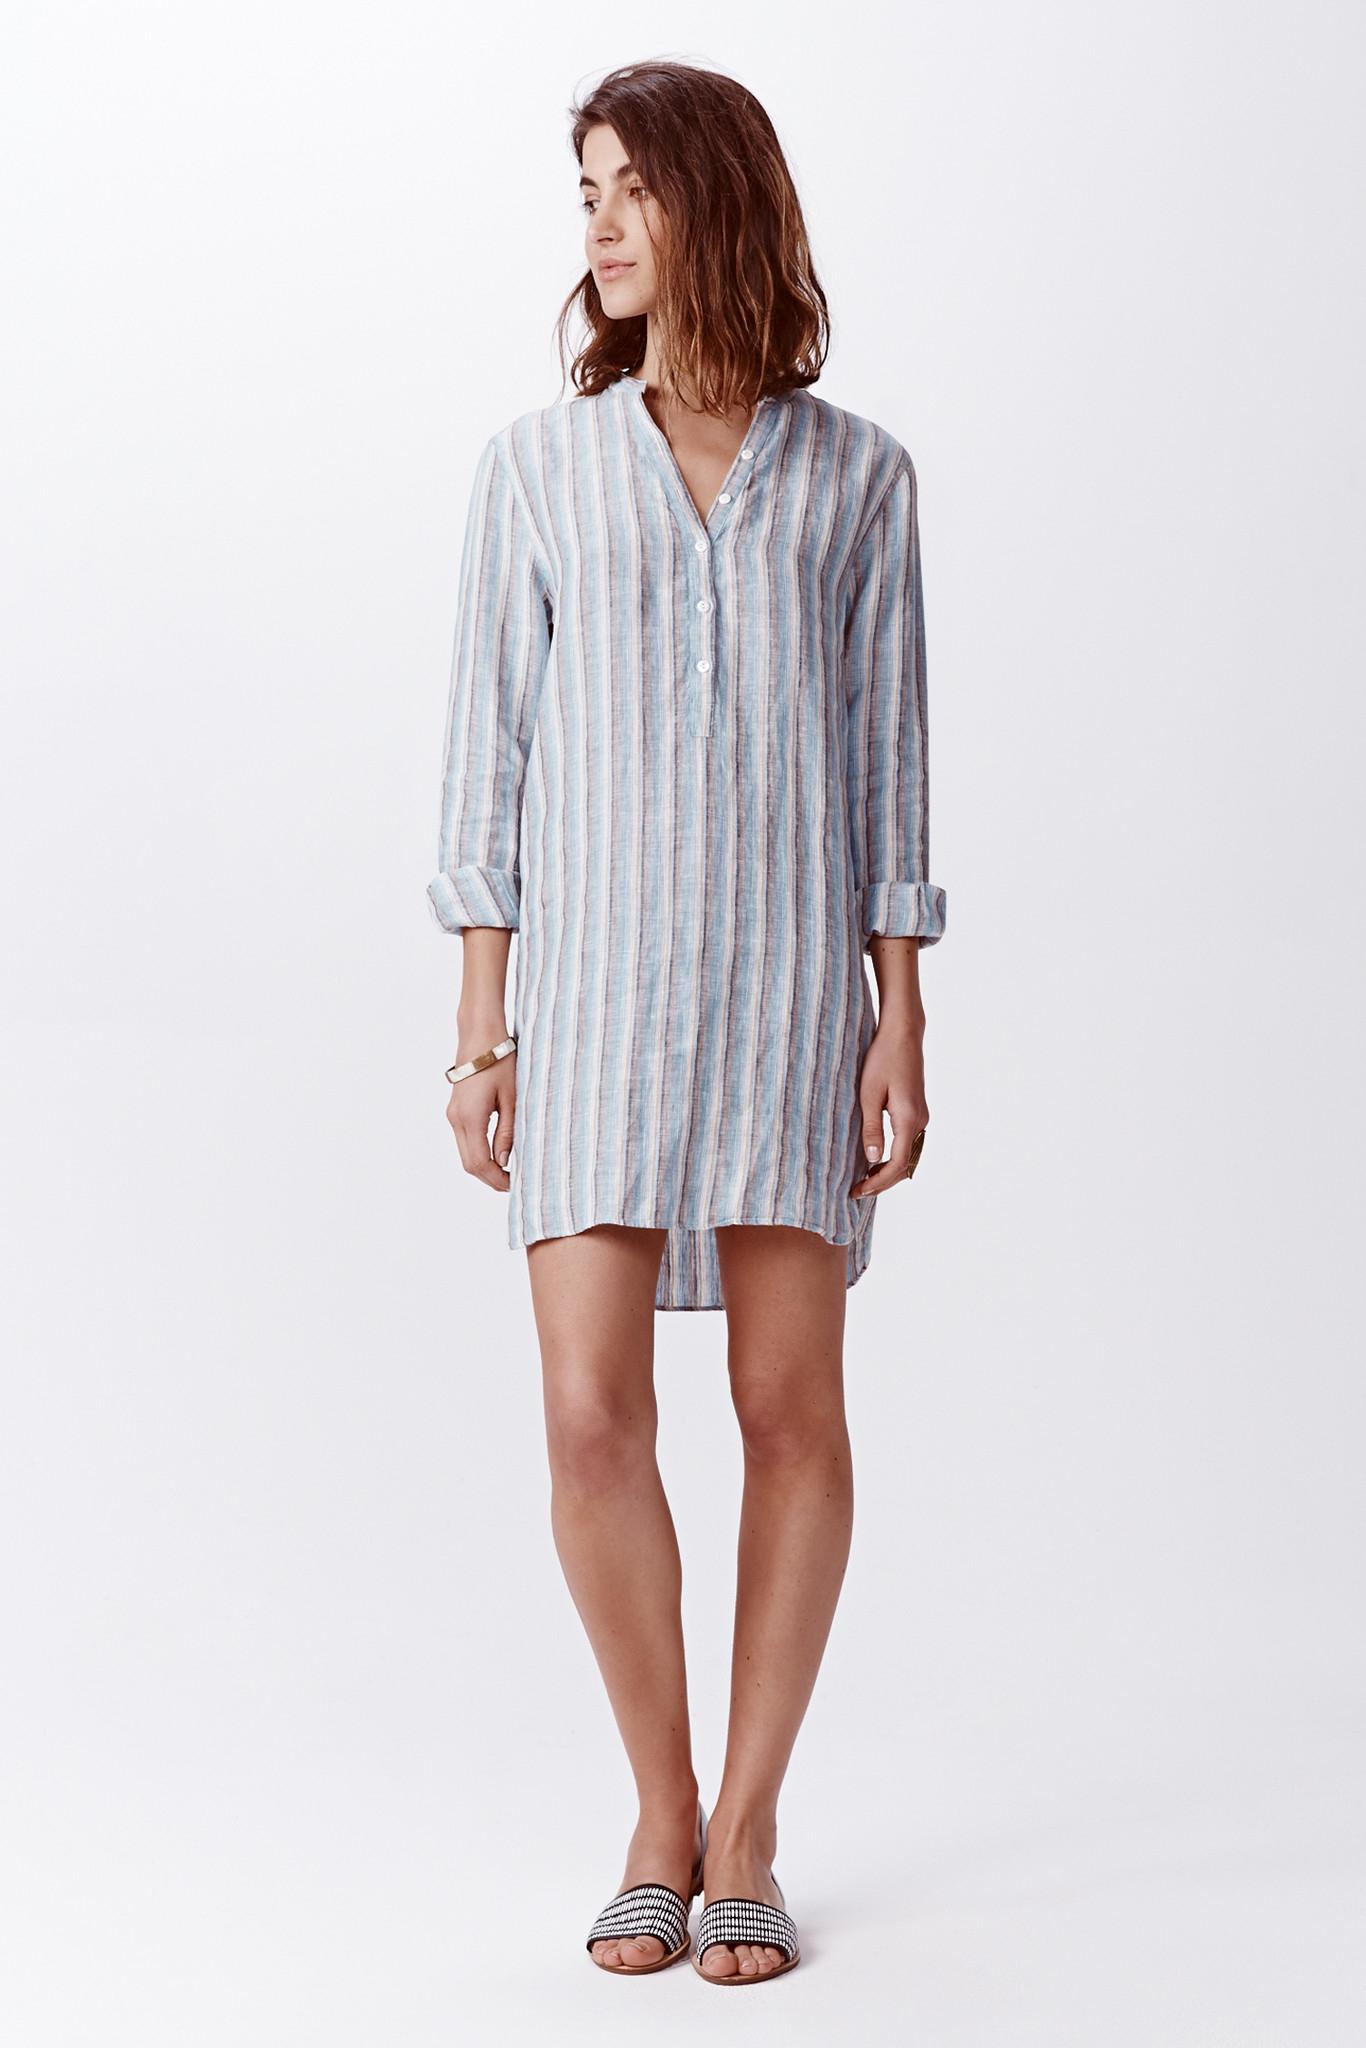 Faherty Brand Stripe Linen Shirt Dress In Blue Reef Blue